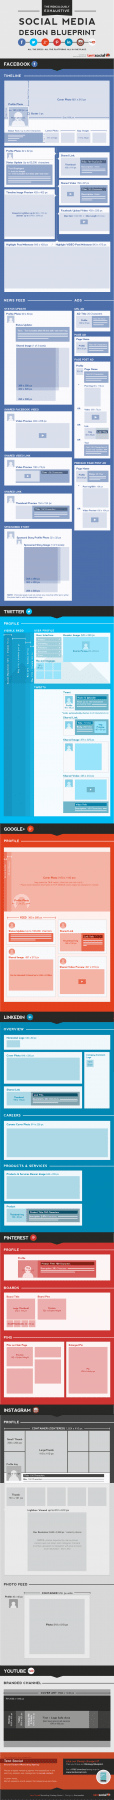 Social Media Design blueprint